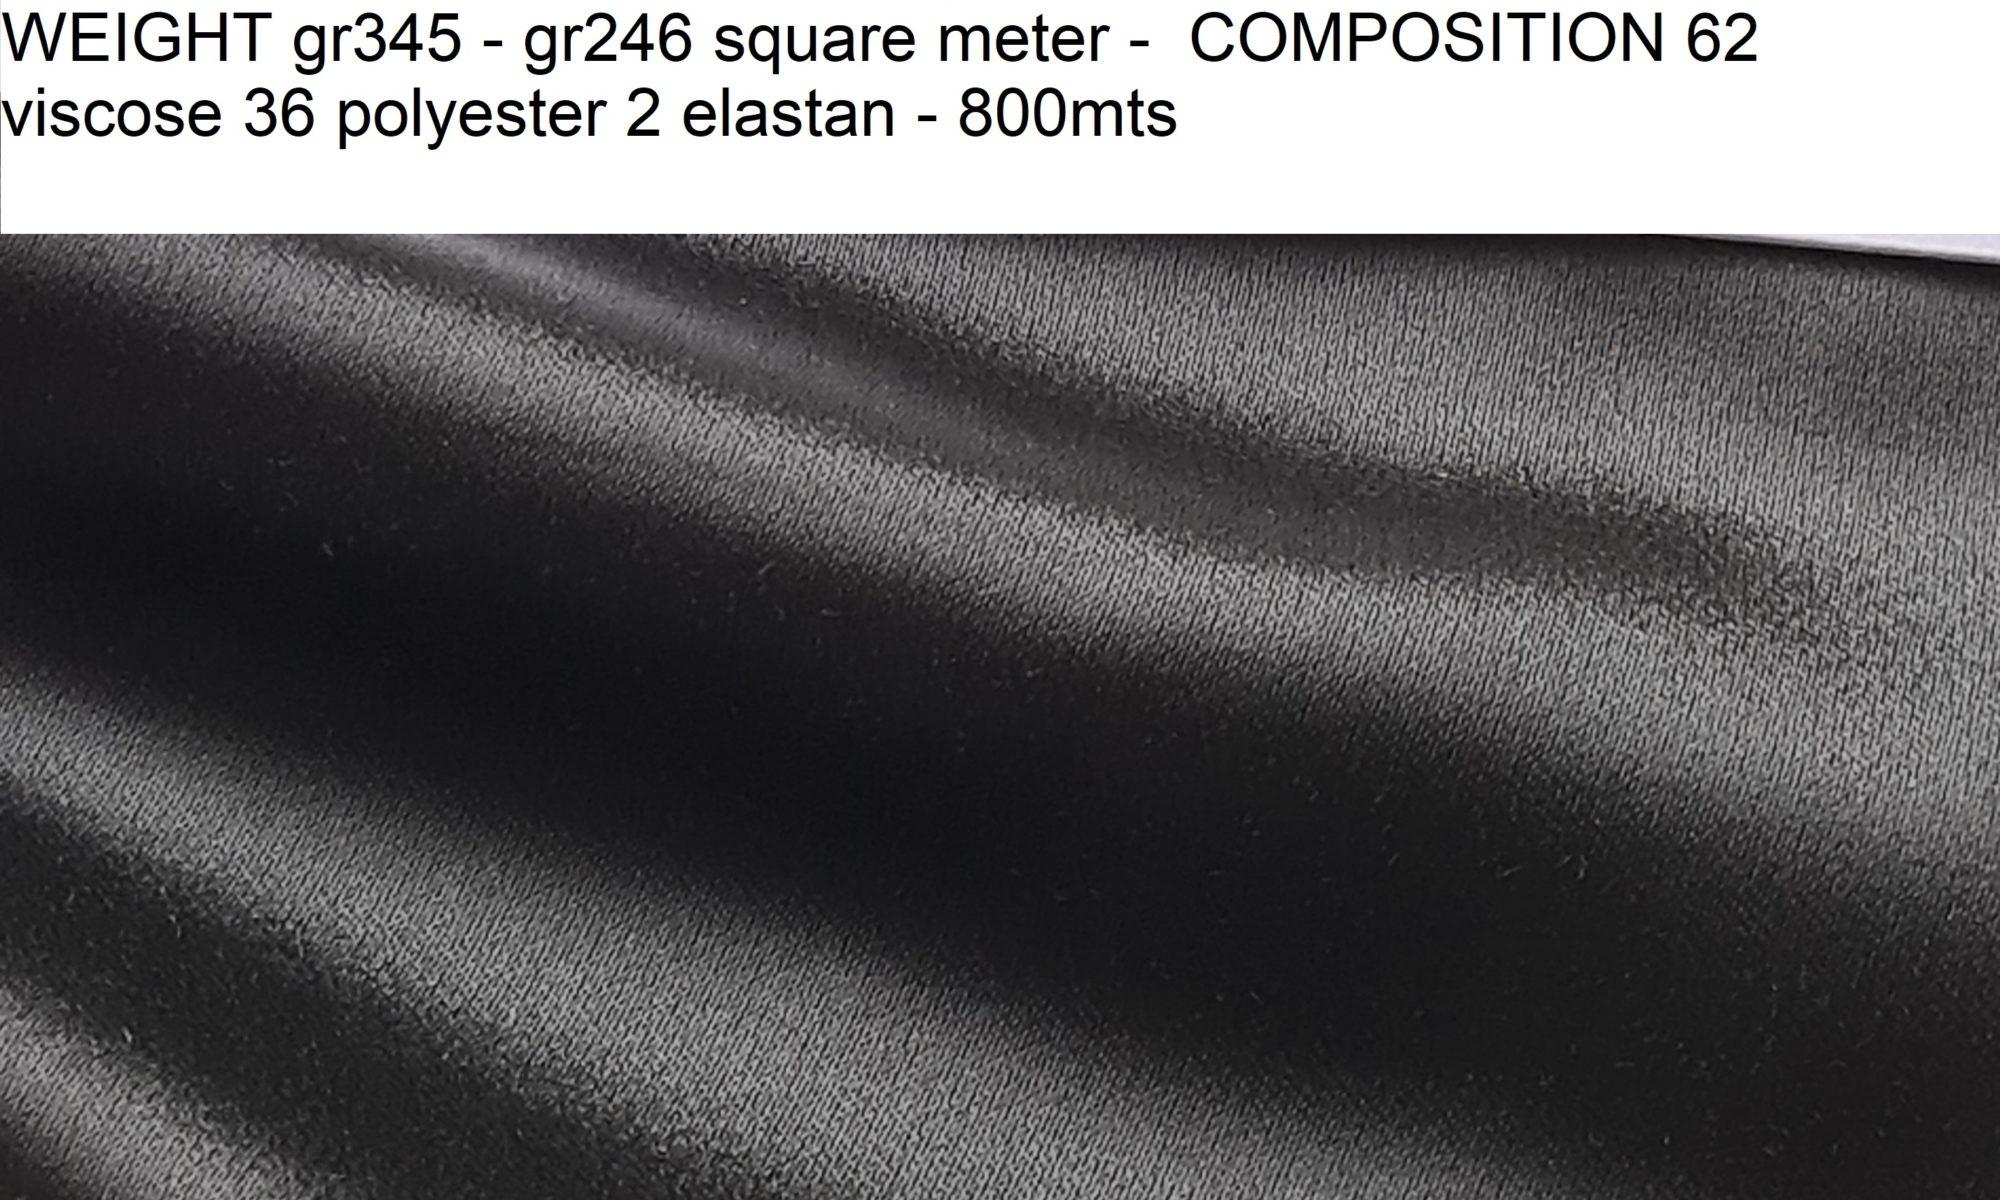 7580 black viscose sateen shirt jacket fabric WIDTH cm140 WEIGHT gr345 - gr246 square meter - COMPOSITION 62 viscose 36 polyester 2 elastan - 800mts